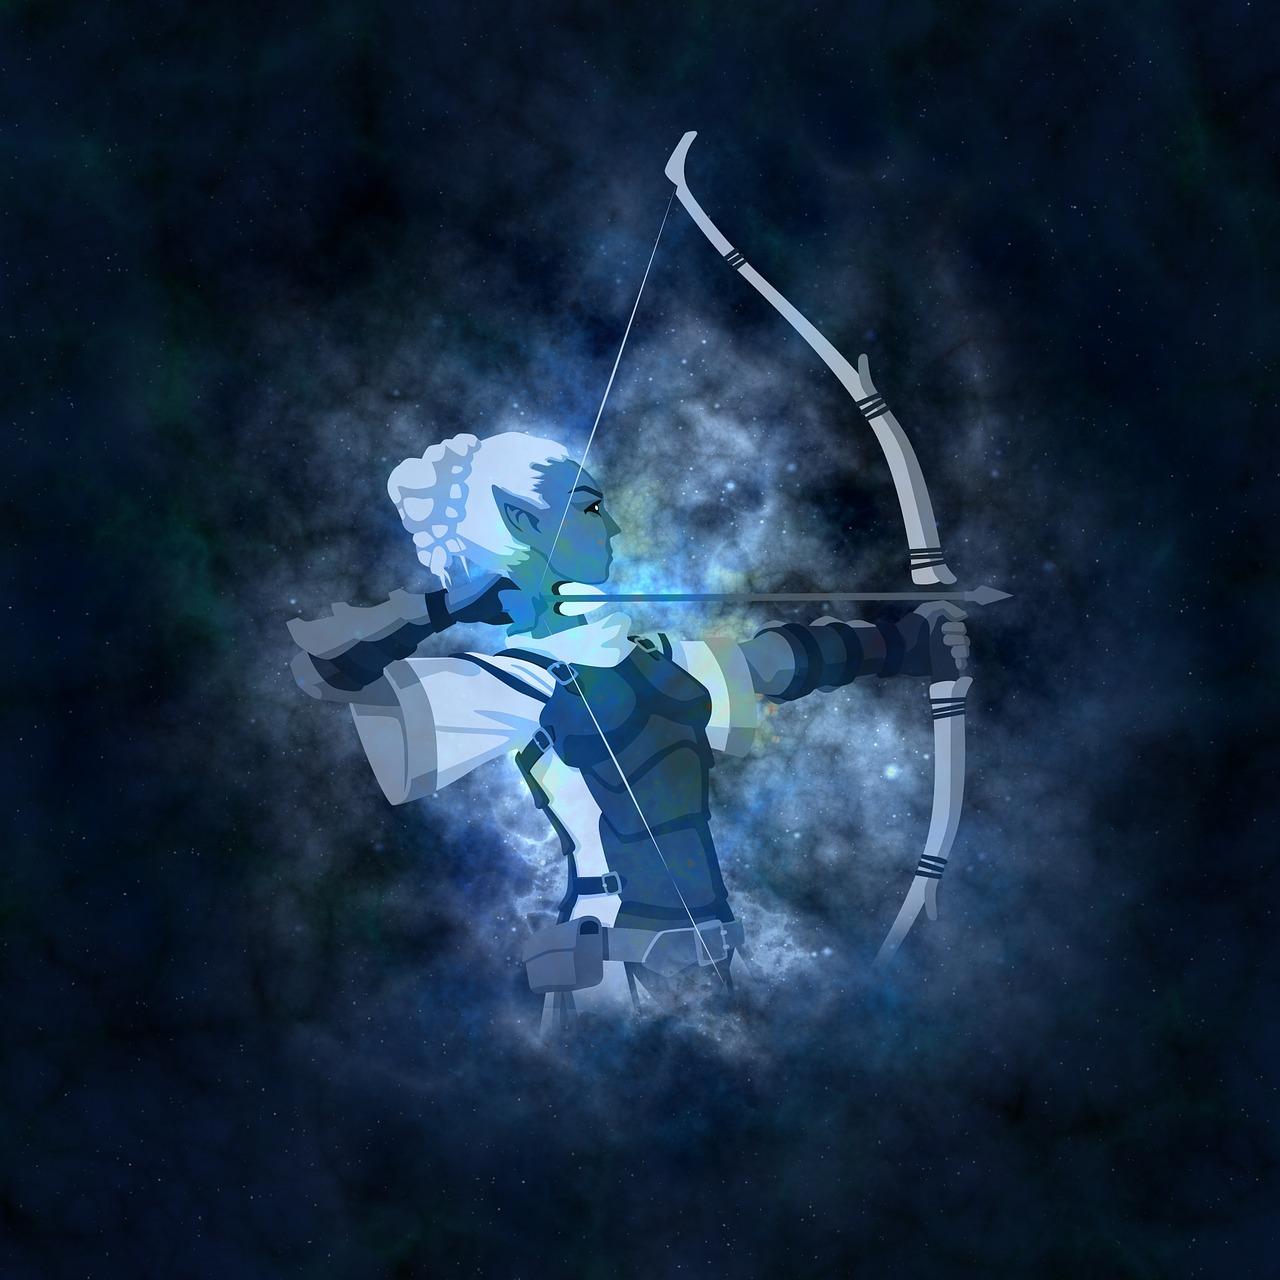 Horoskop - Horoskopski znak Strelac